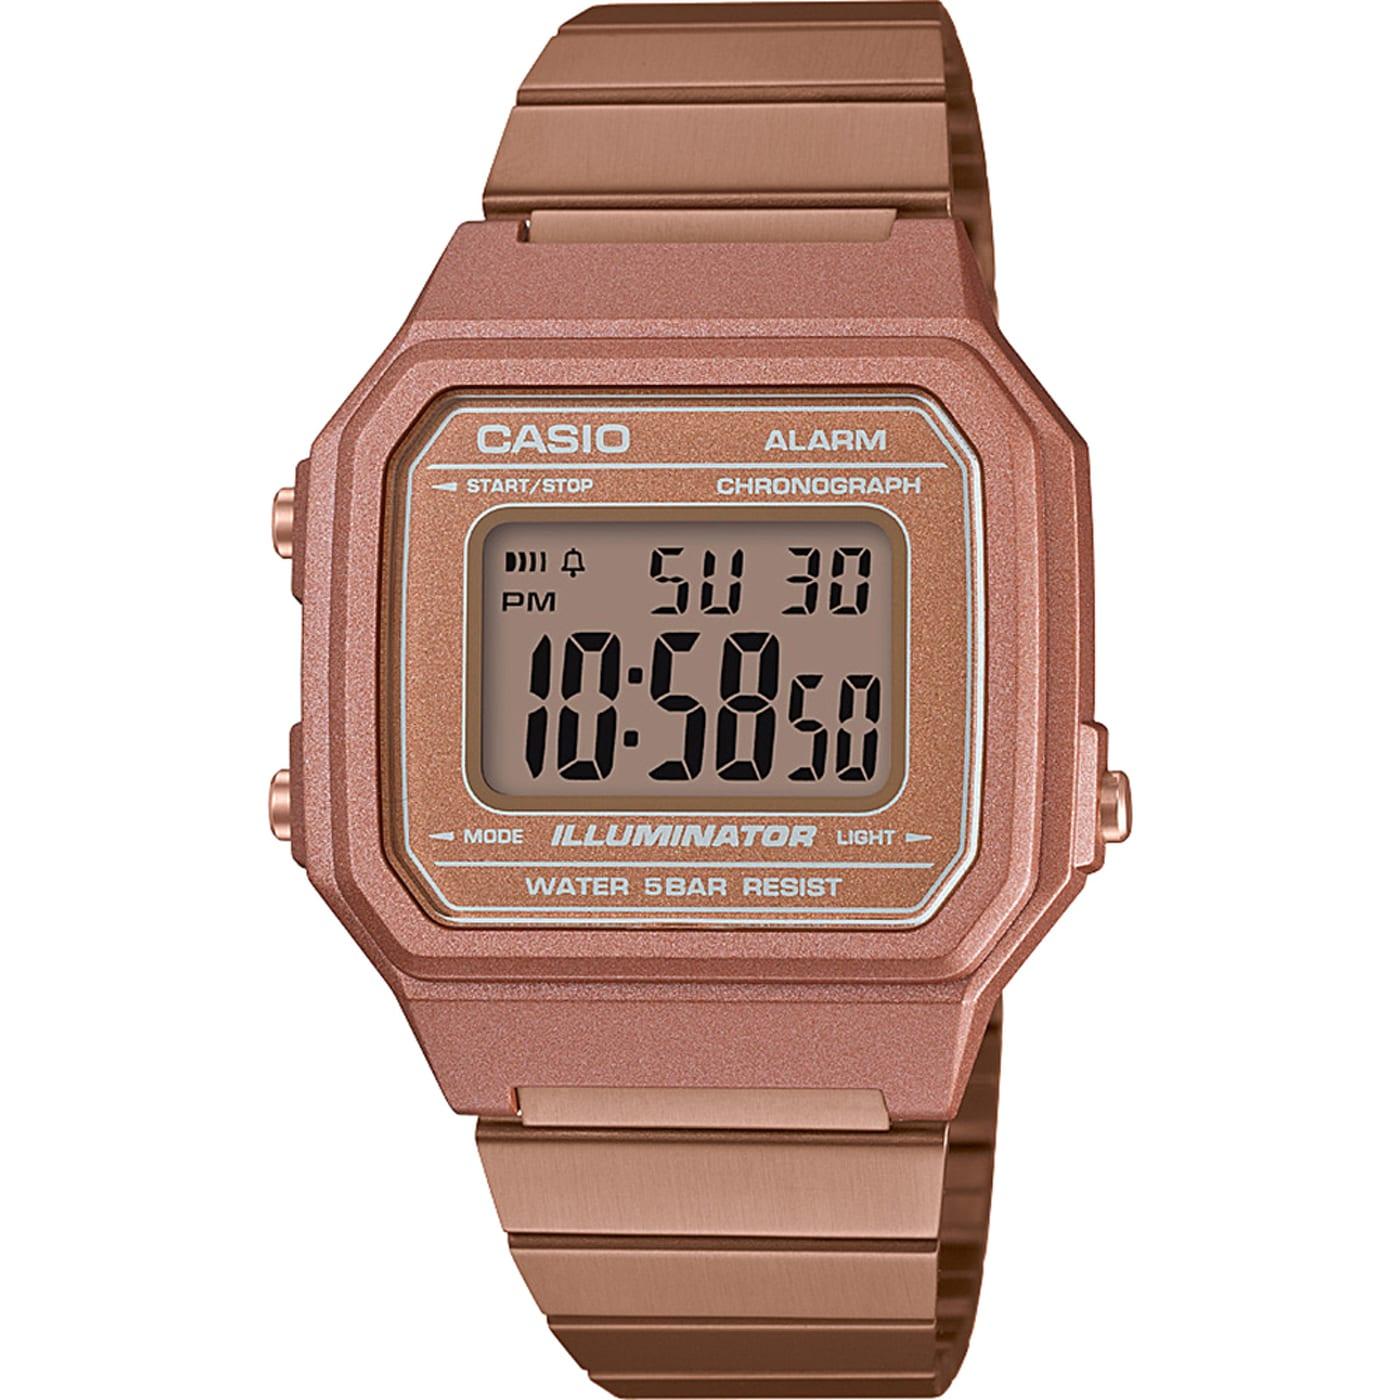 Casio B650WC-5AEF bronze